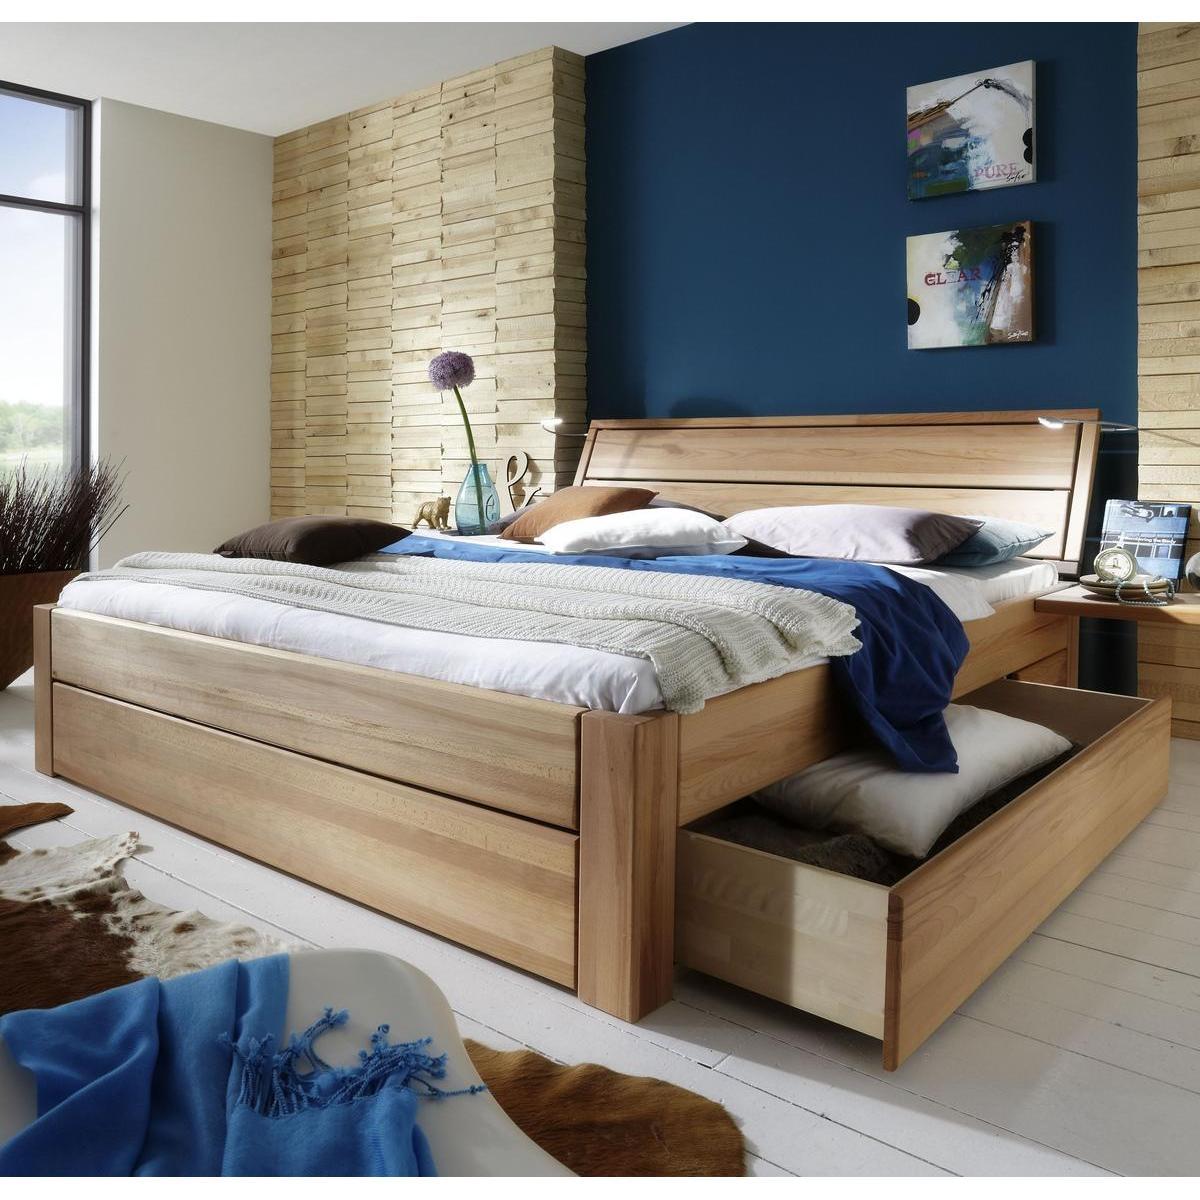 massivholz schubkastenbett 180x200 easy sleep kernbuche massiv ge lt 9418 93 52 87. Black Bedroom Furniture Sets. Home Design Ideas